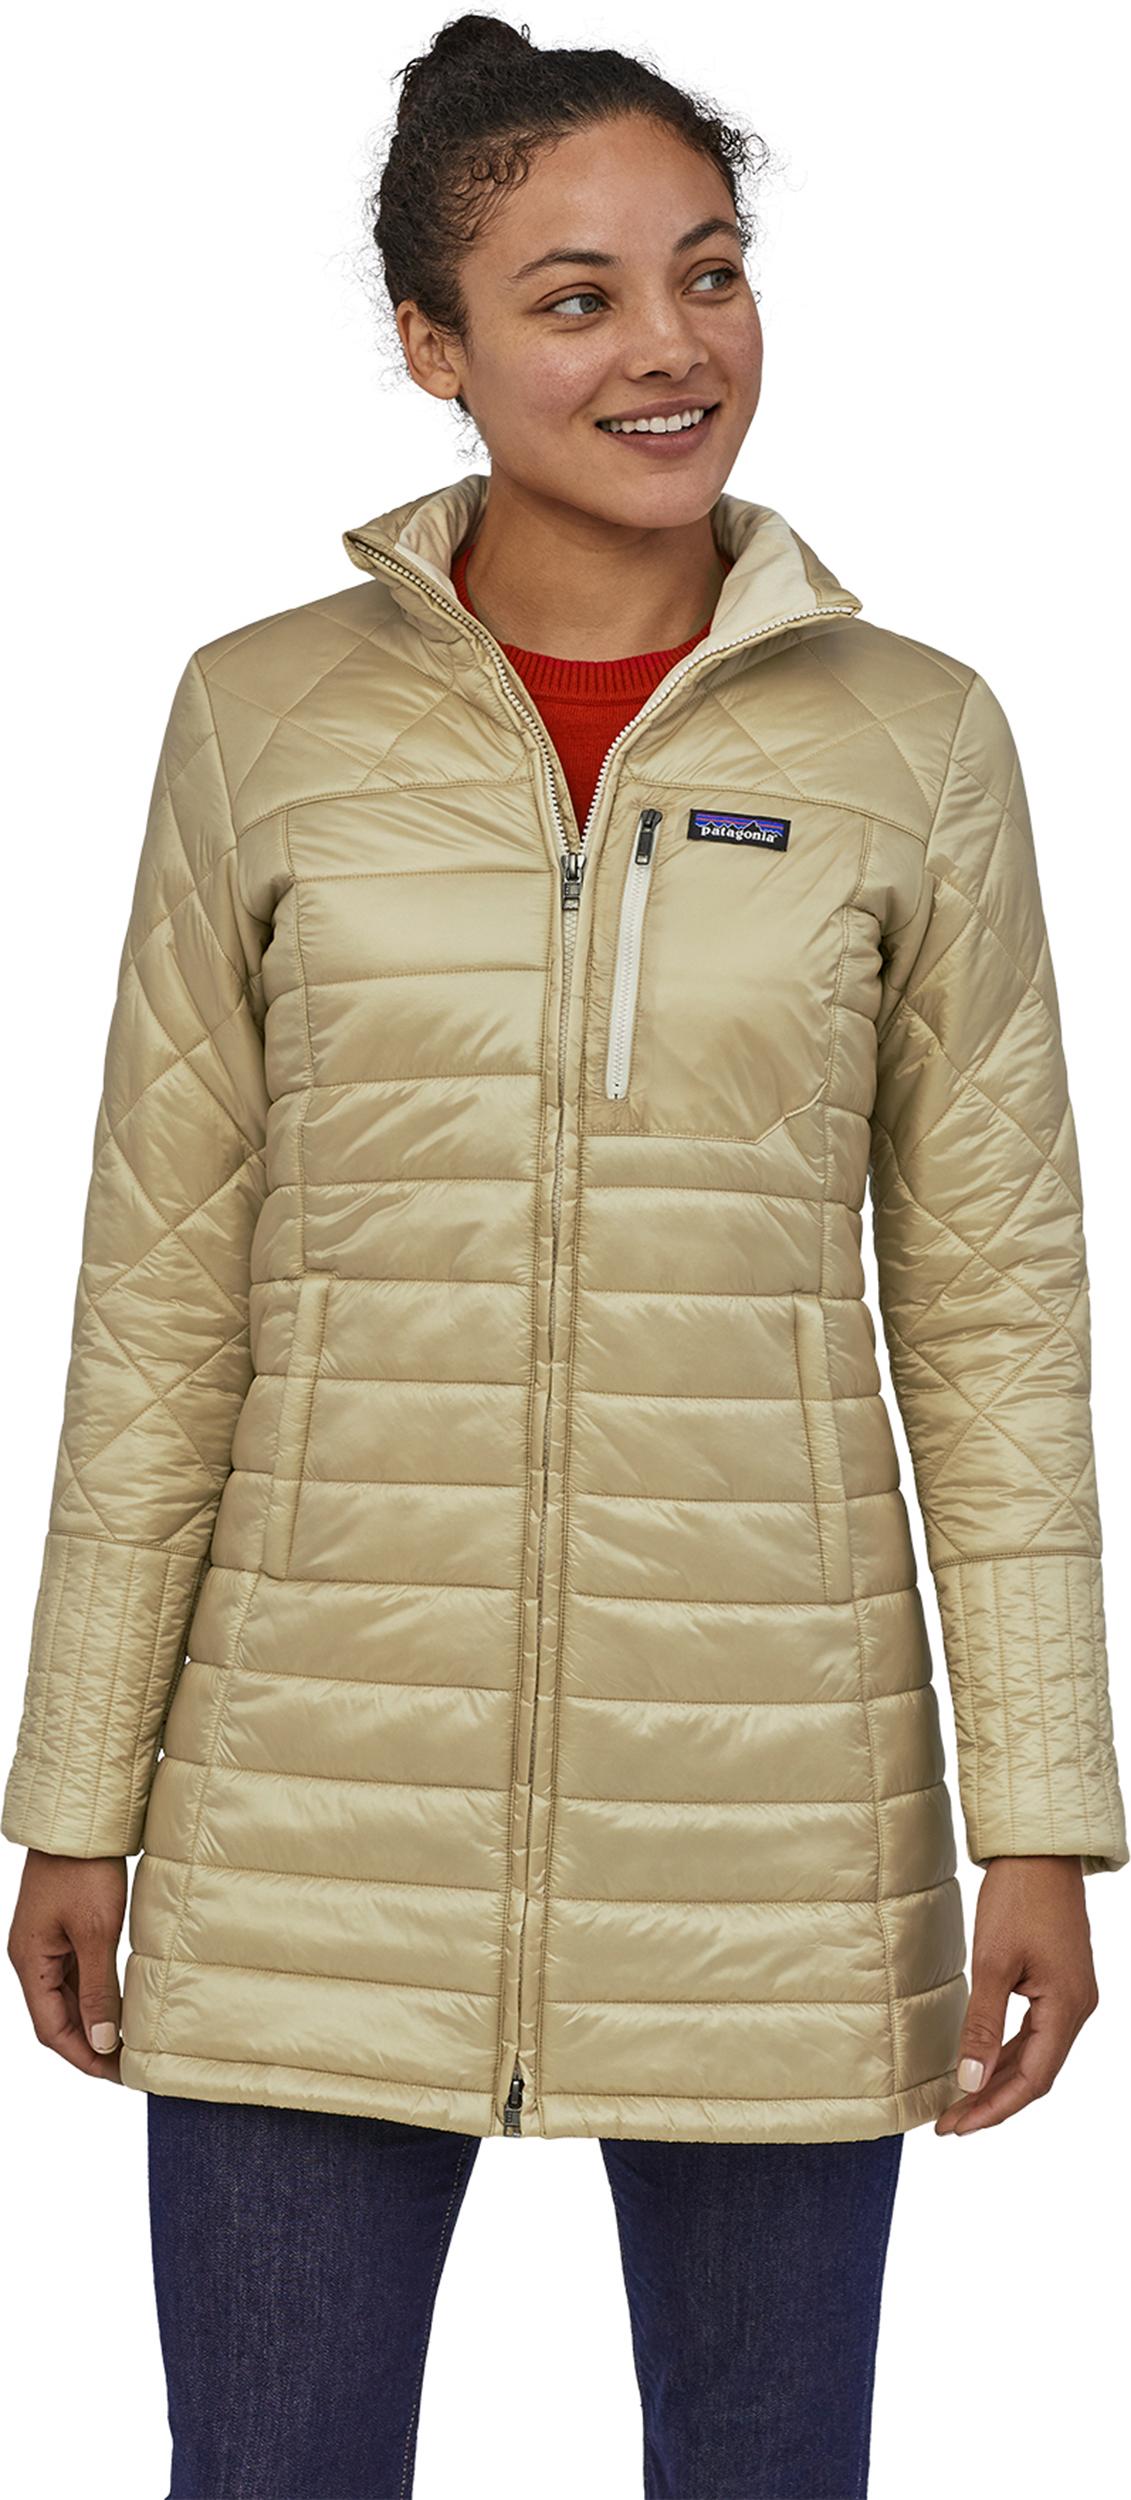 the best attitude 4689b 76373 Parkas and winter coats | MEC